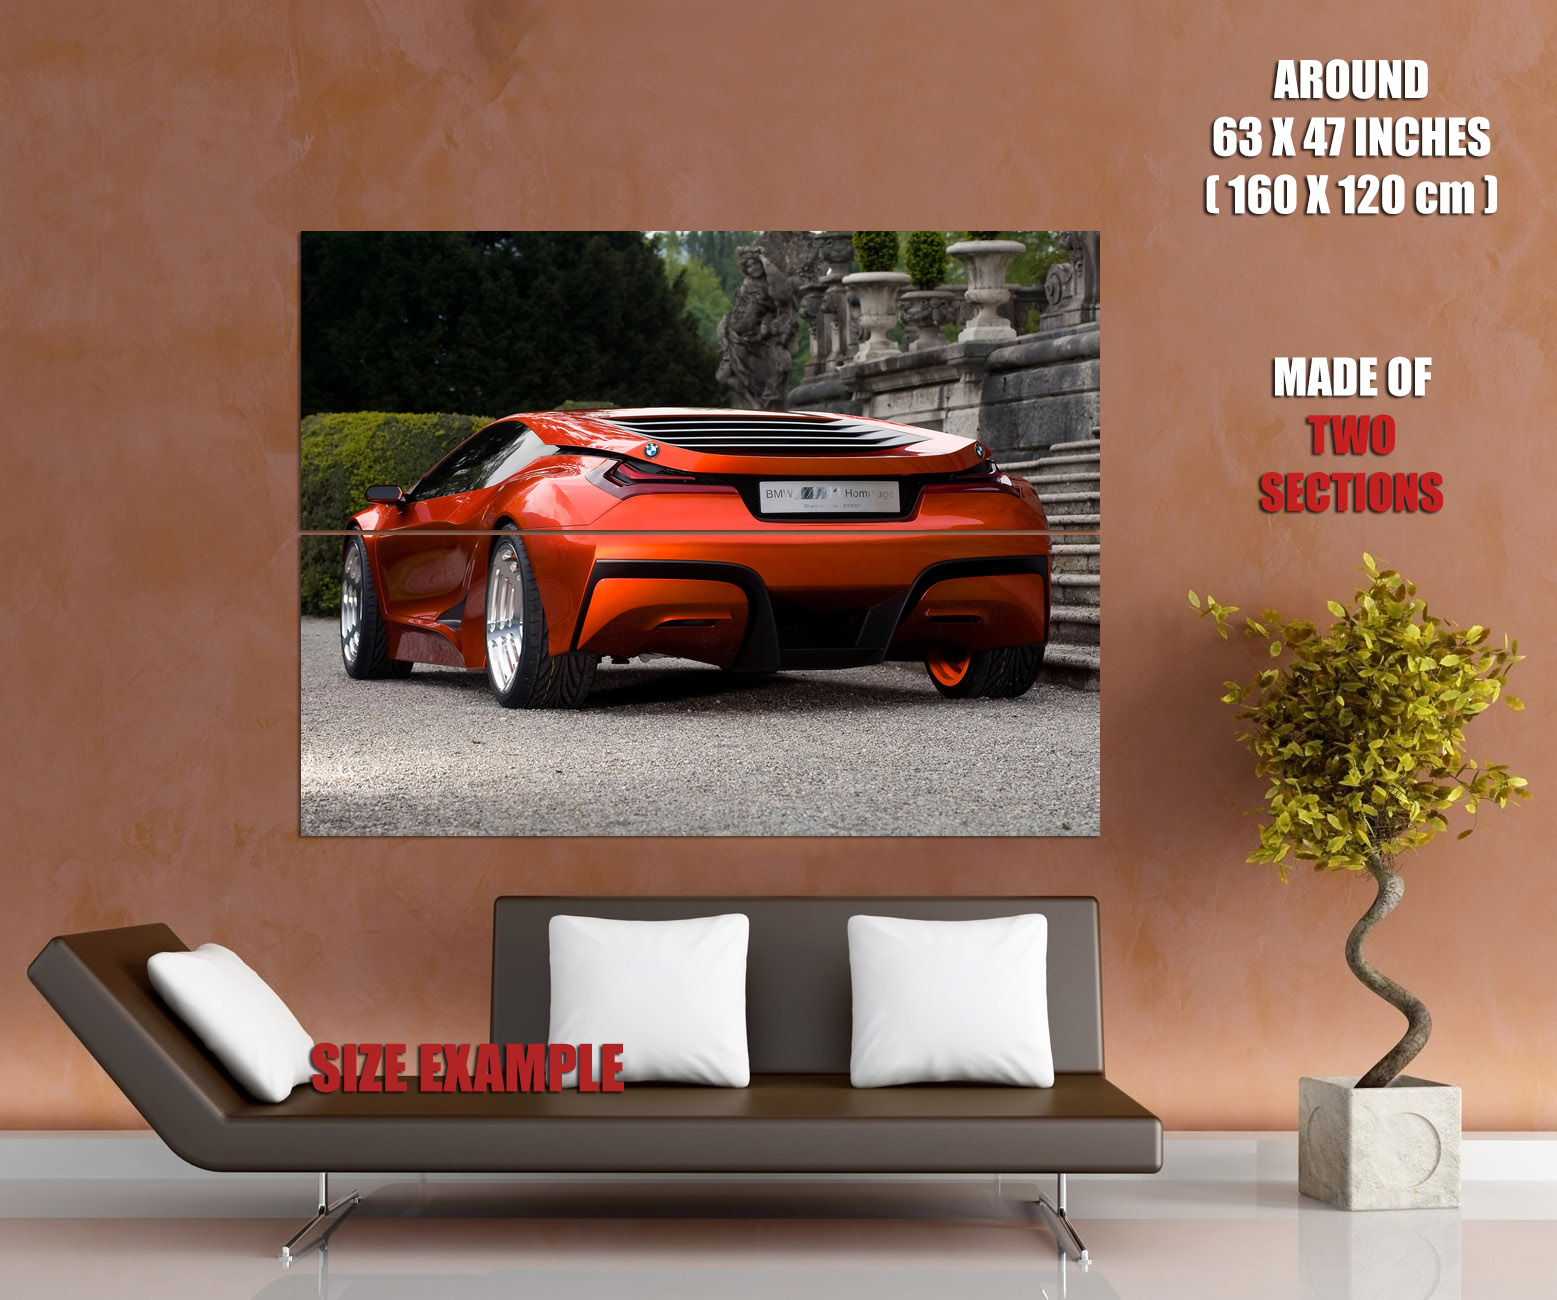 BMW 5 Series bmw m1 rear BMW M1 Rear Red Future Concept Car Gigantic Print POSTER | eBay